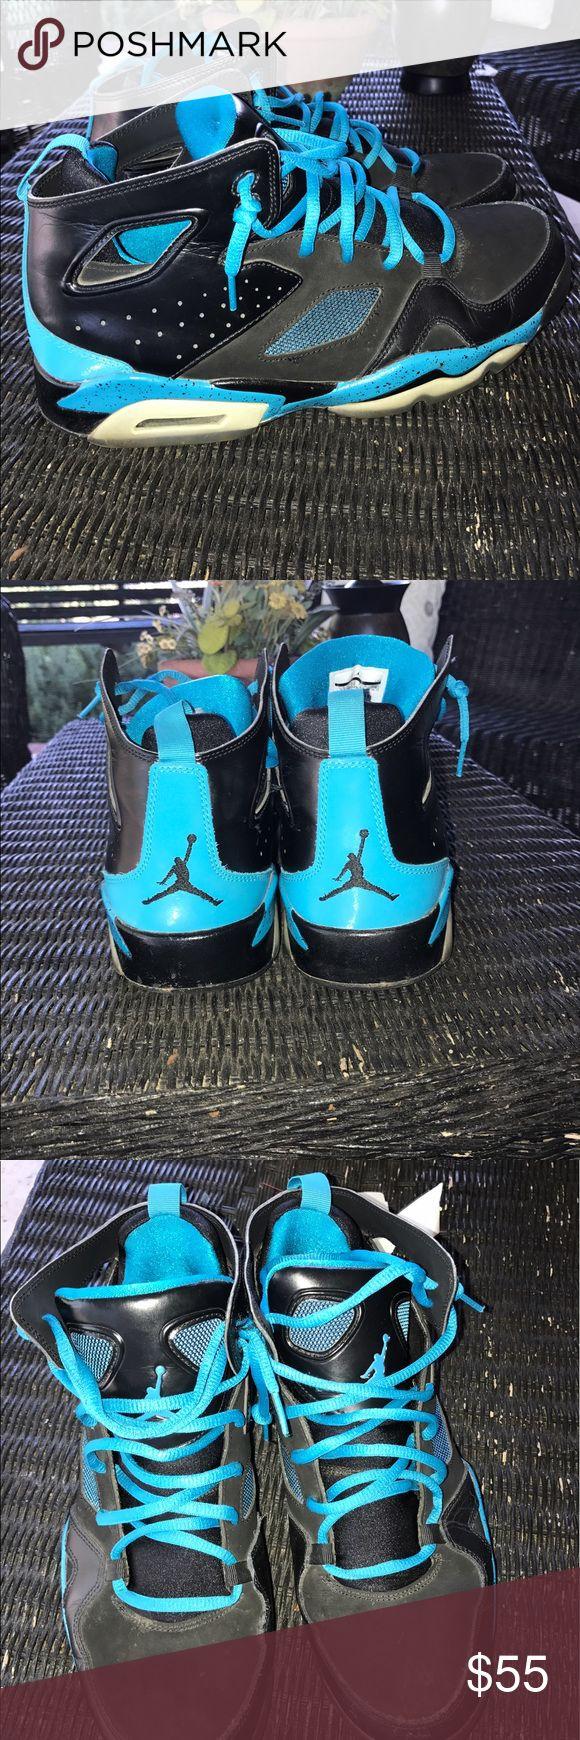 Jordan 5's blue and black size 11 Real Jordan's in pretty good shape. Slight wear but no major flaws. Size 11. Air Jordan Shoes Sneakers